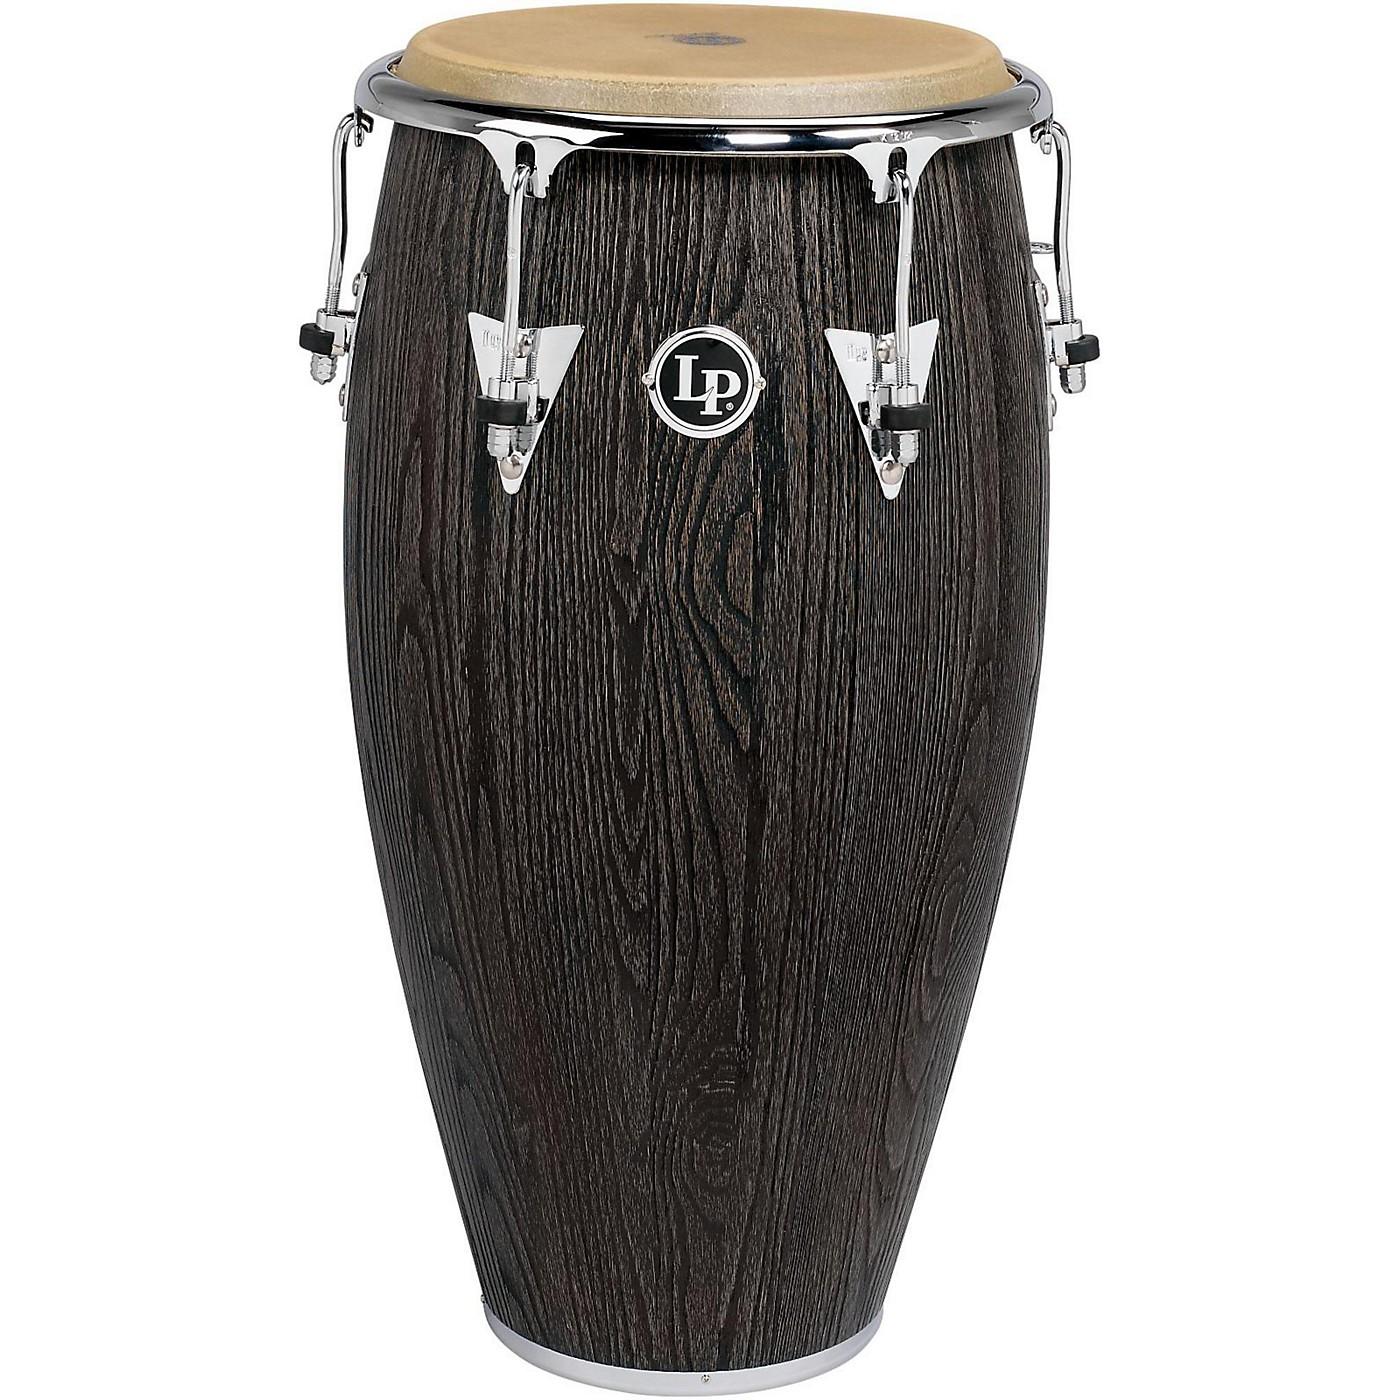 LP Uptown Series Sculpted Ash Conga Drum Chrome Hardware thumbnail